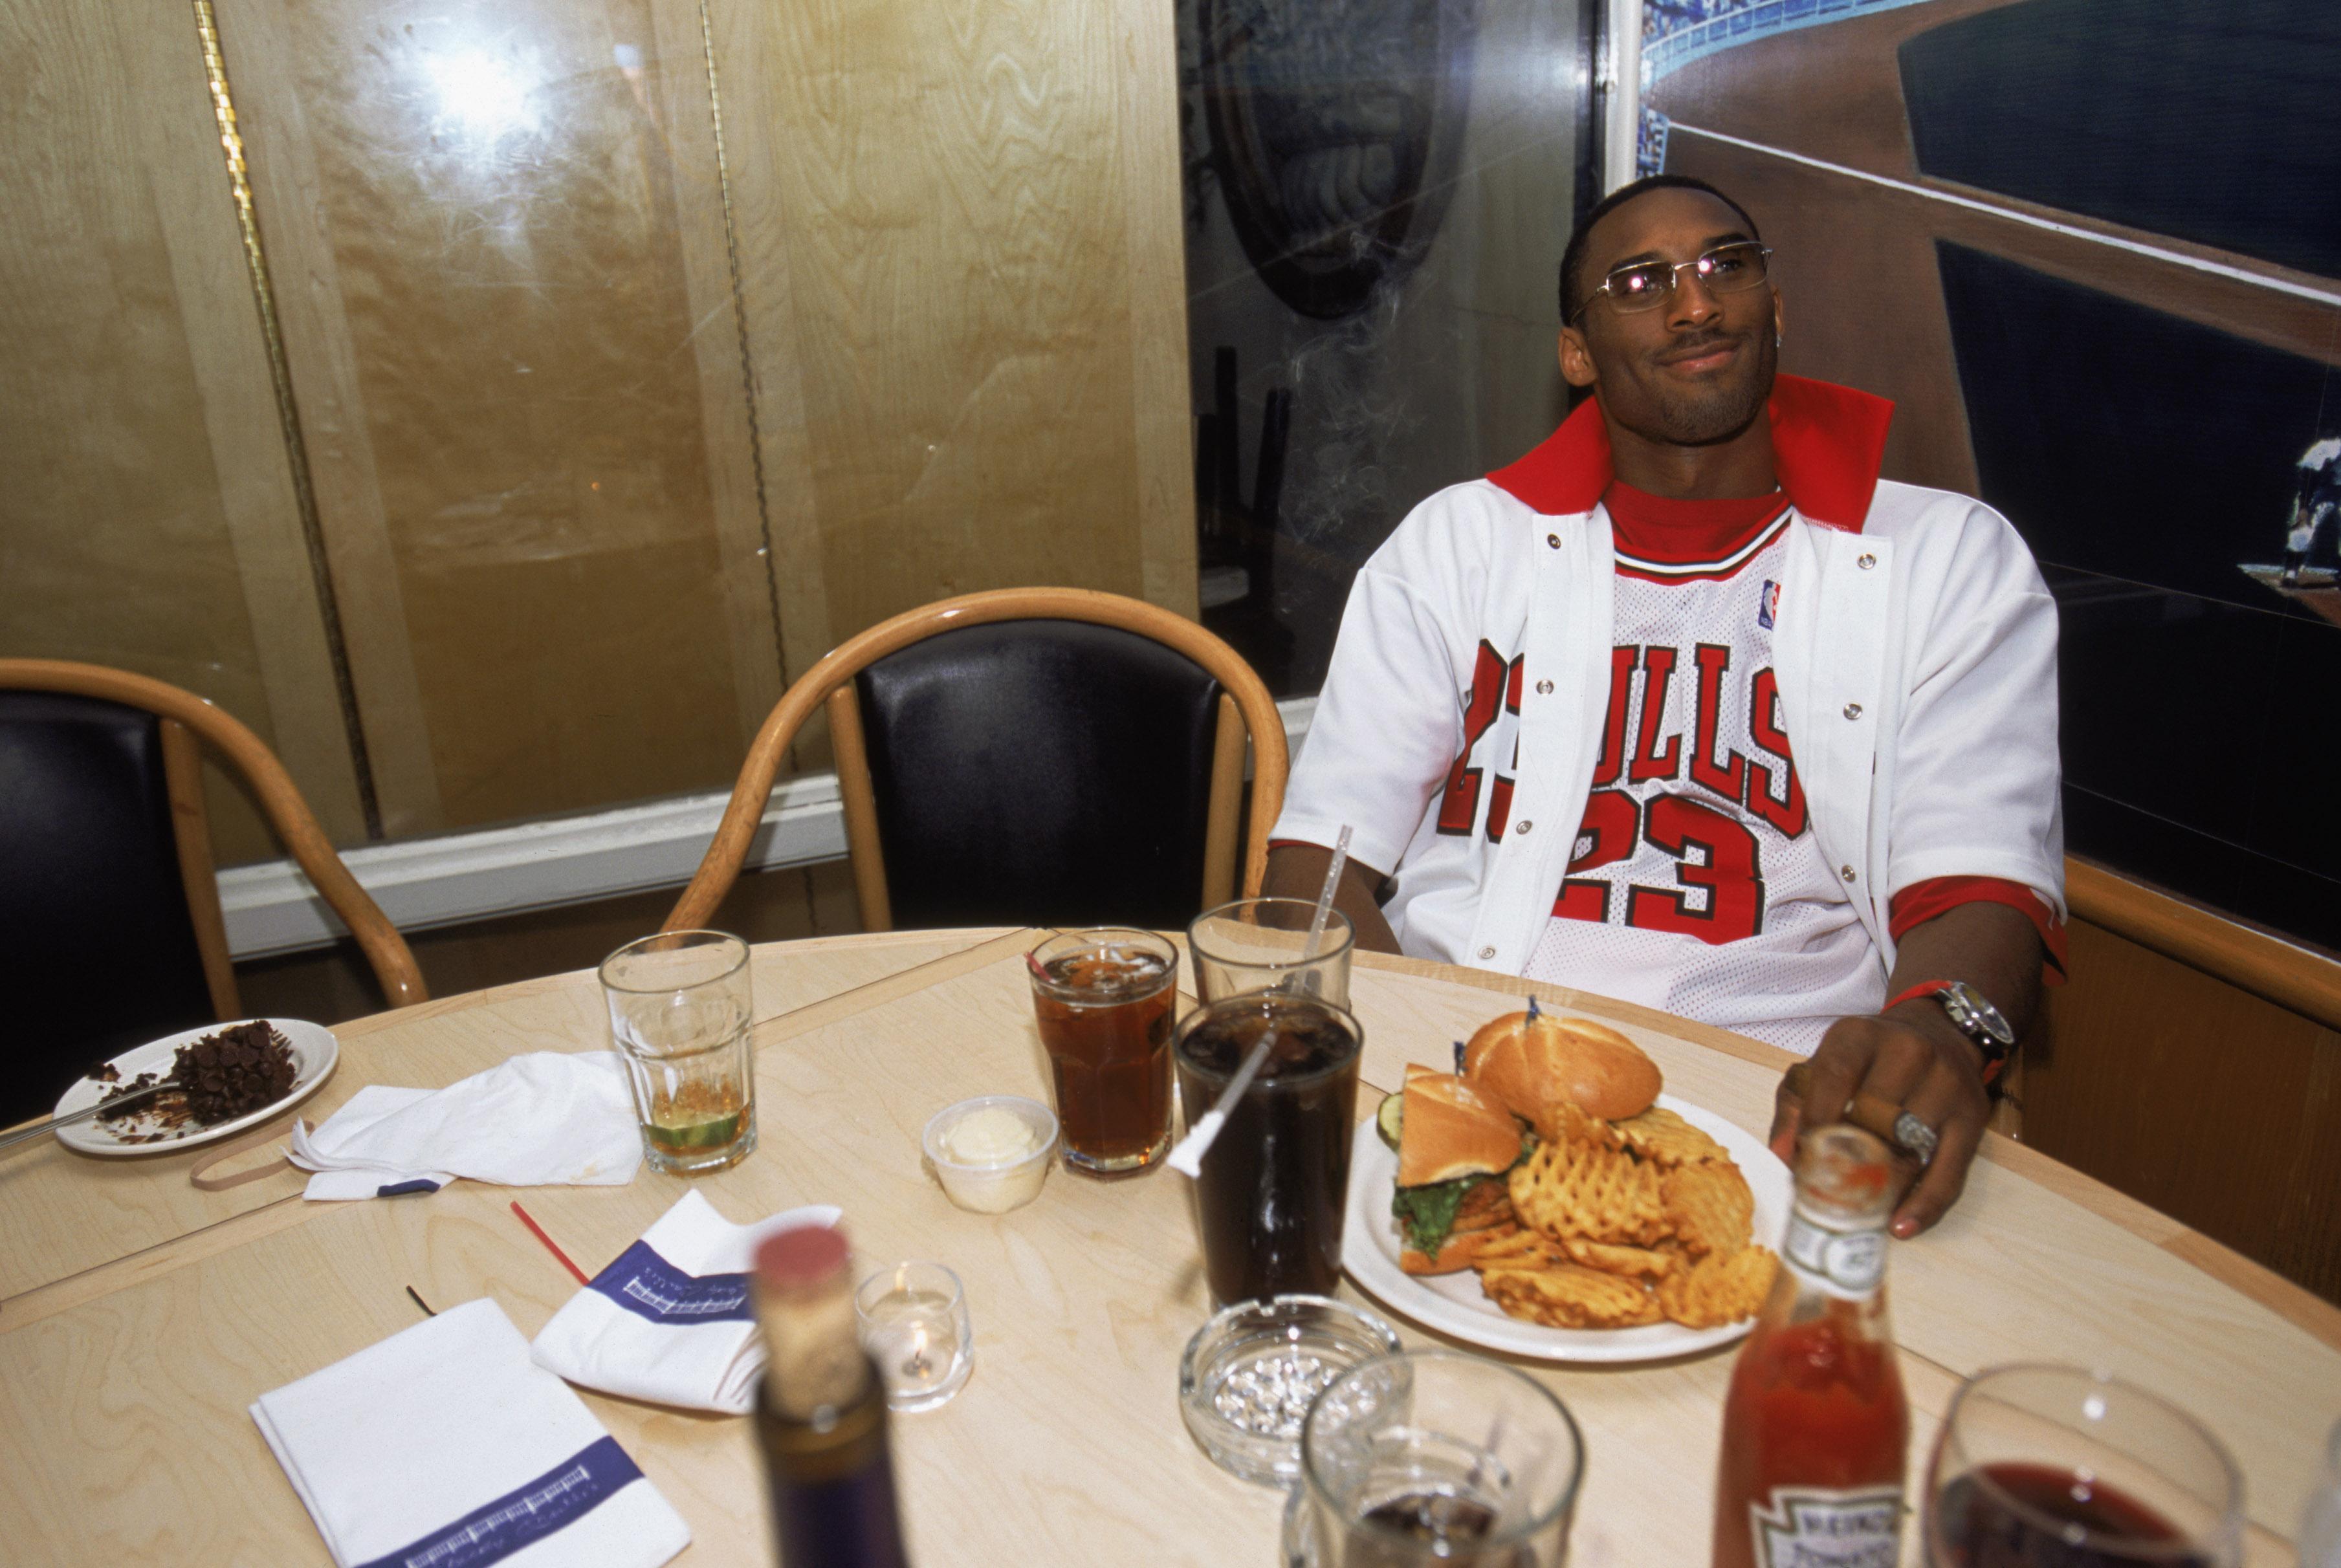 Remember when Kobe Bryant wore a Michael Jordan jersey to NBA Finals?